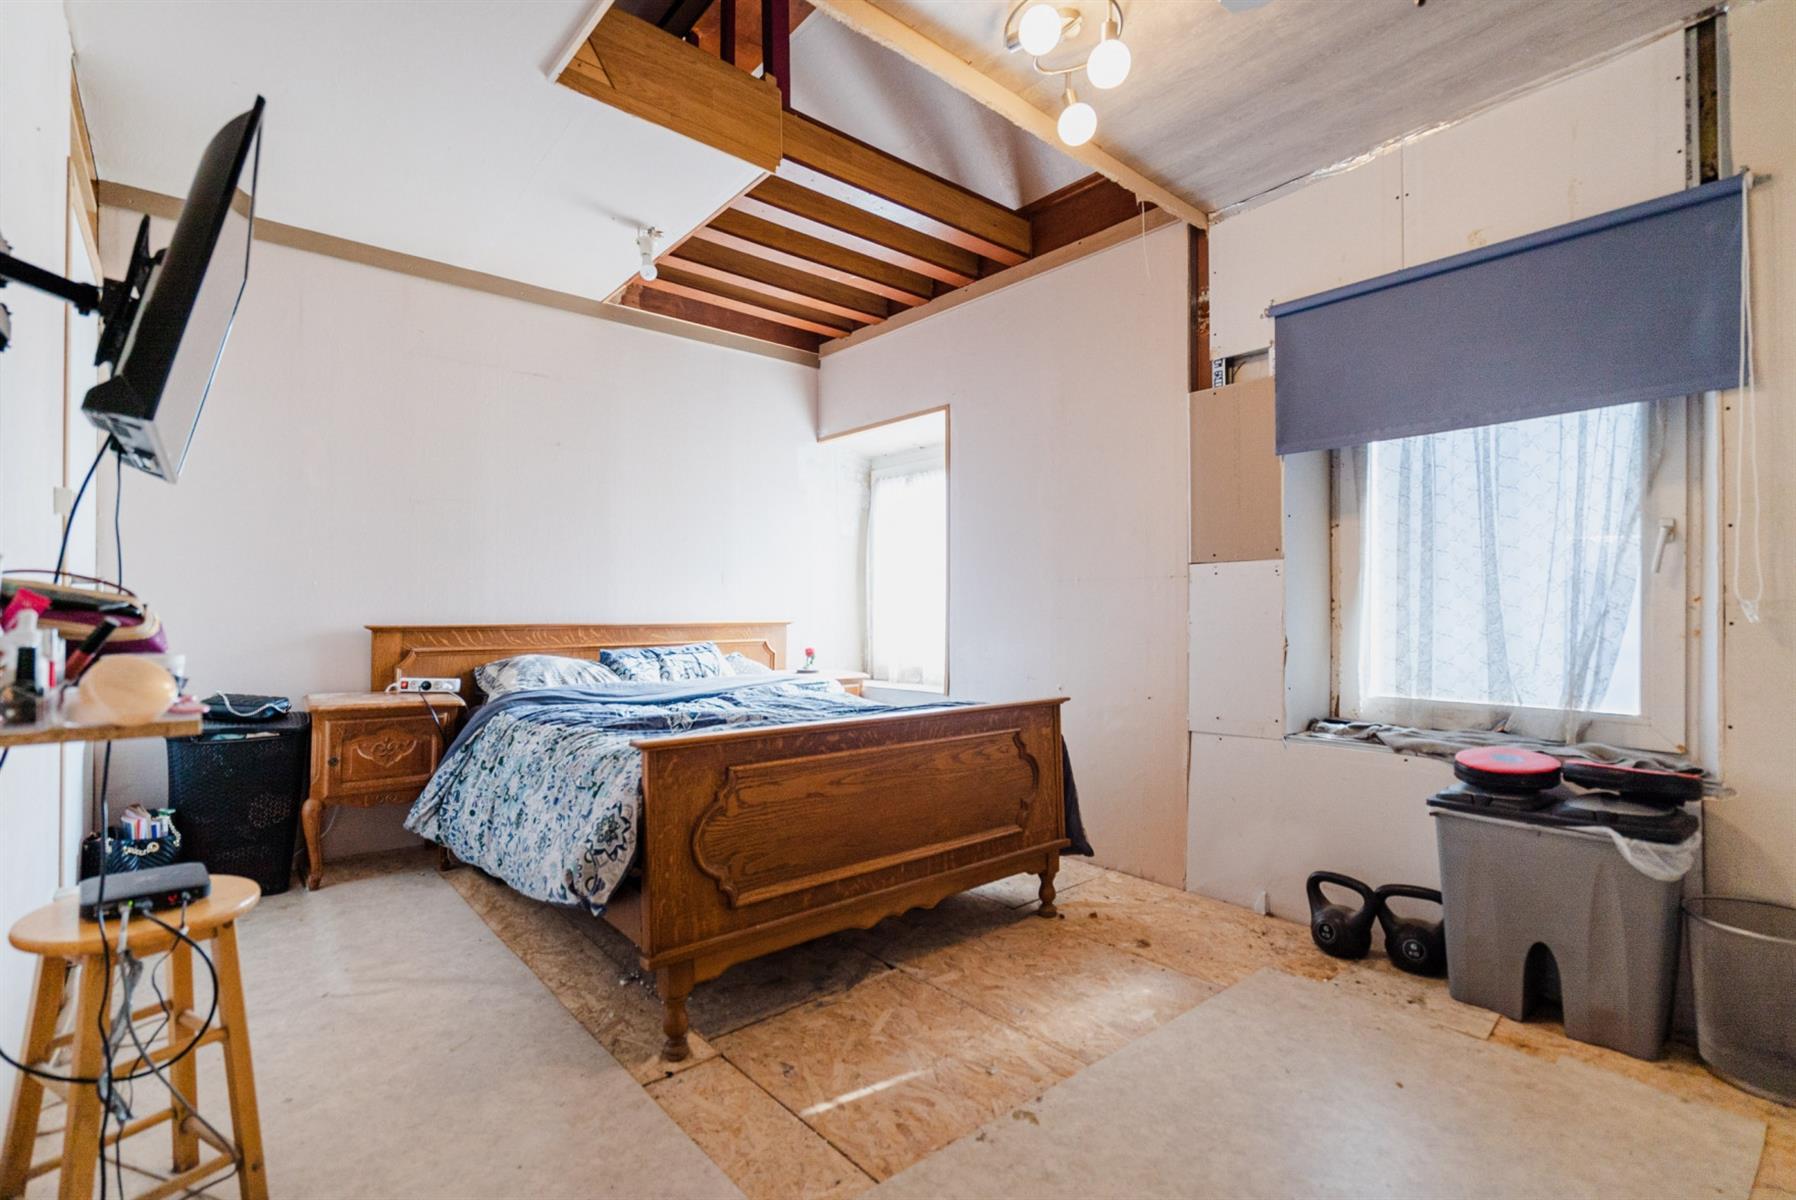 Maison - Oupeye Hermallesous-Argenteau - #4324098-9